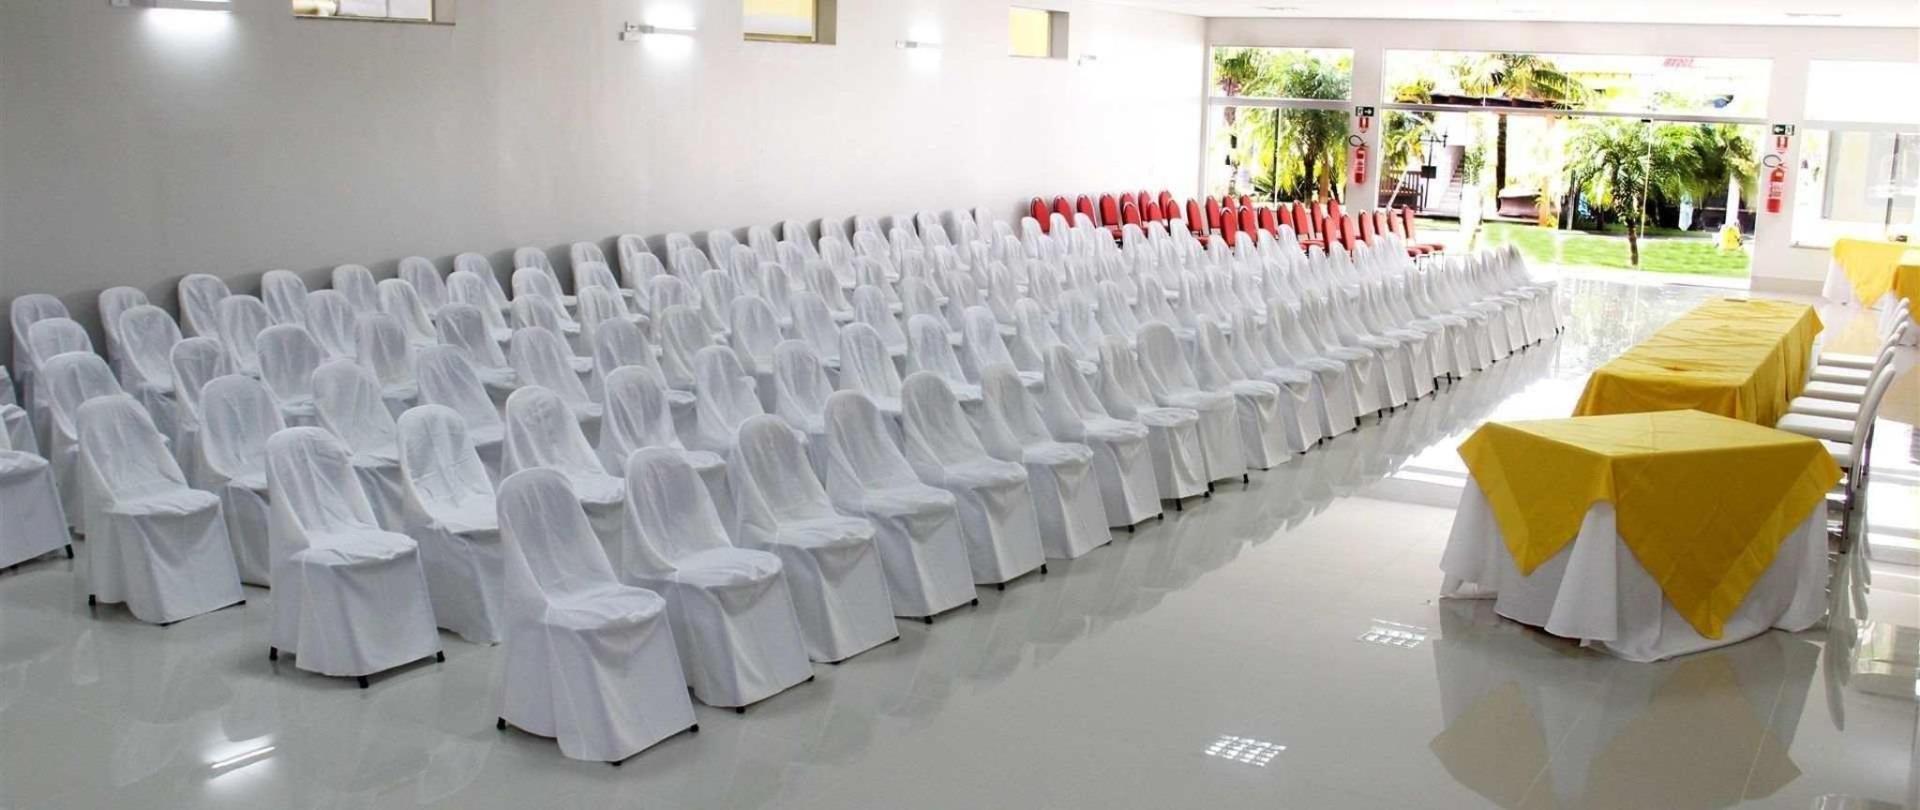 sala-de-eventos-jpg.jpeg